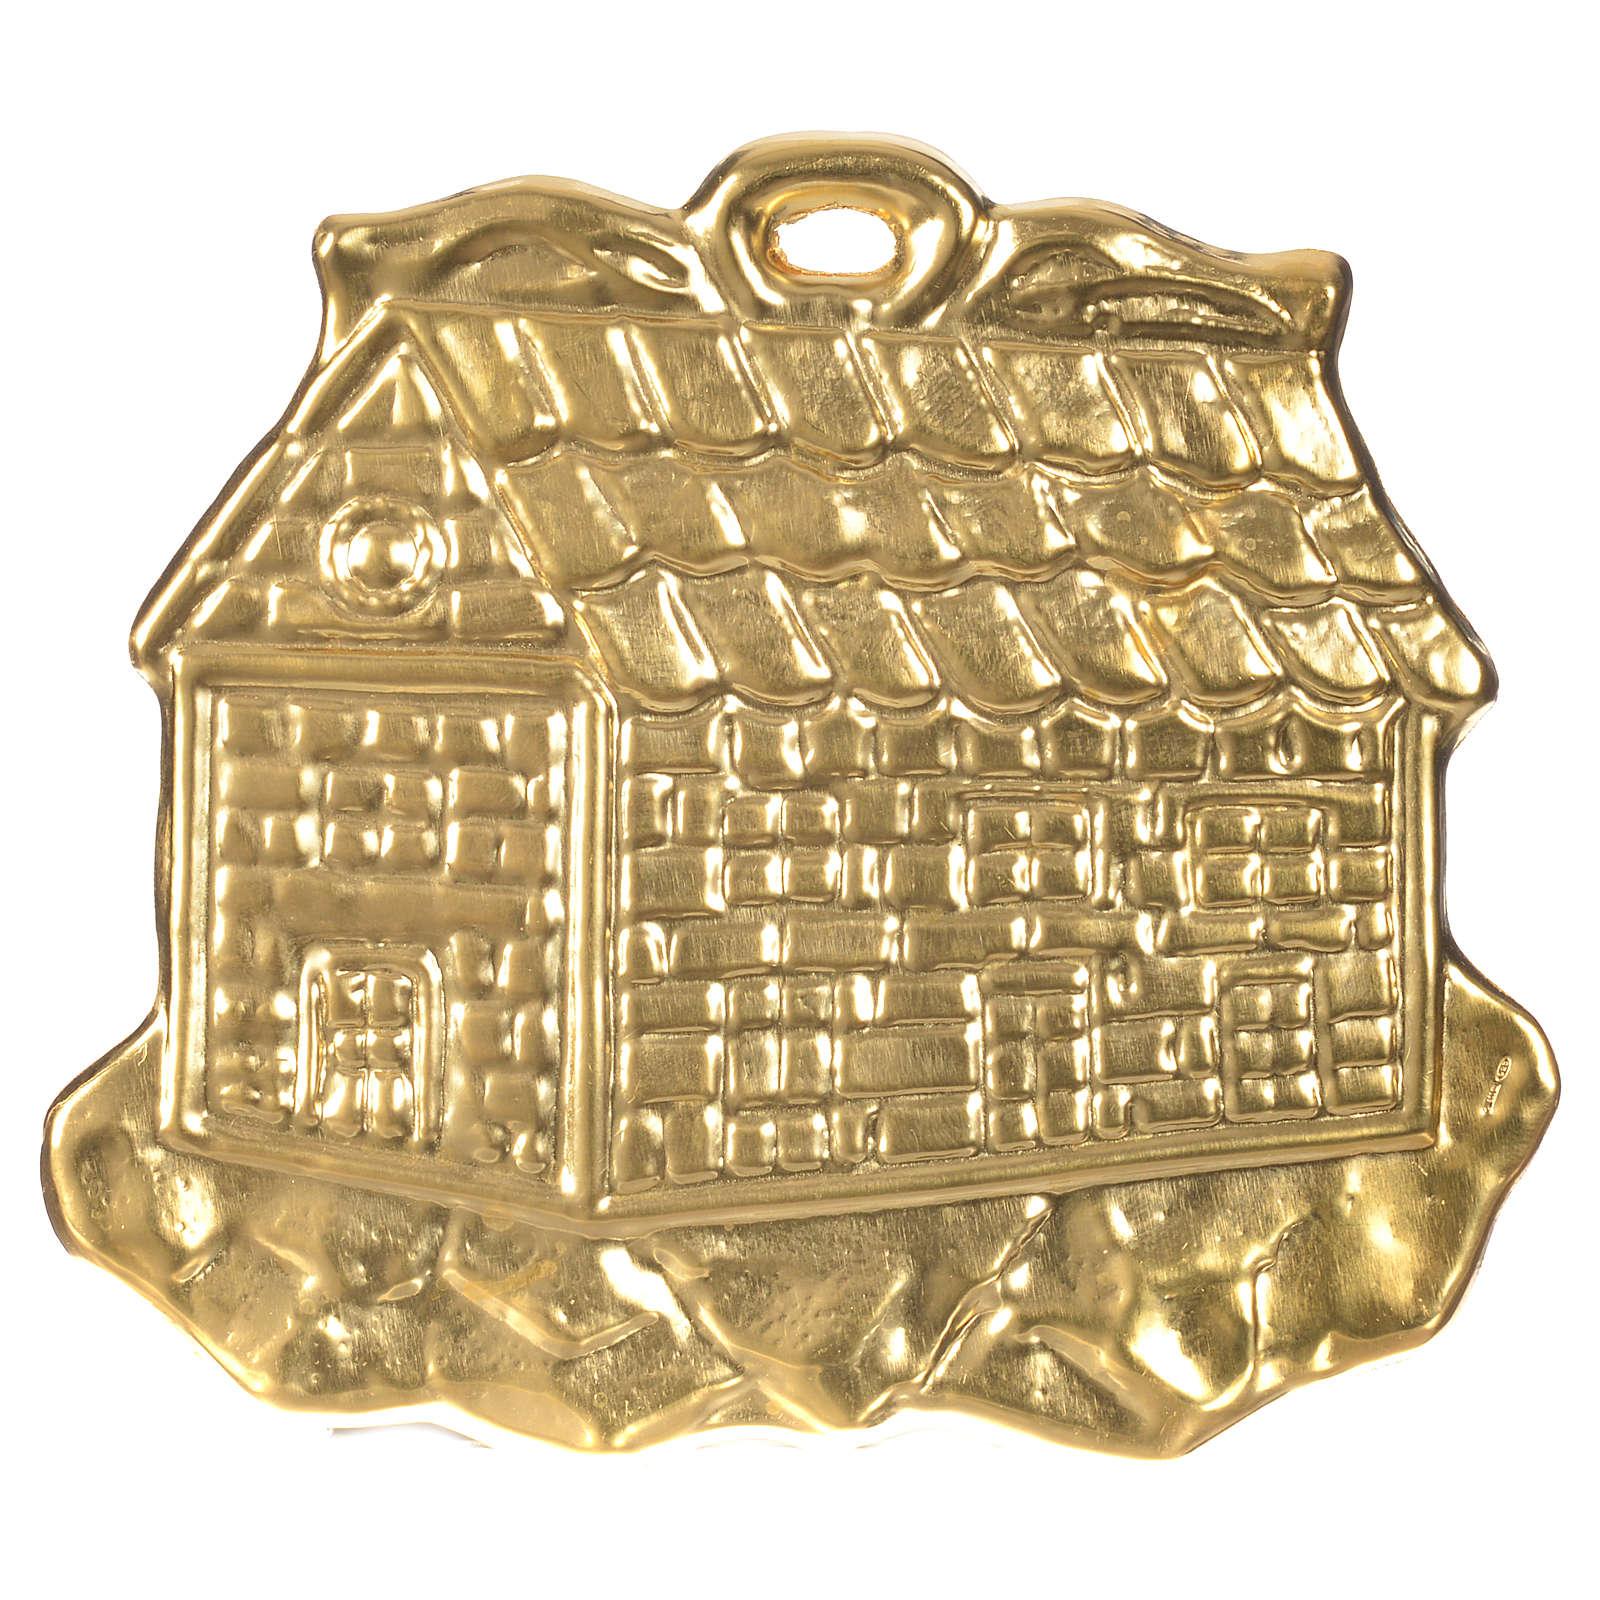 STOCK Casetta ex voto argento 925 dorato 8.5x10 cm 3